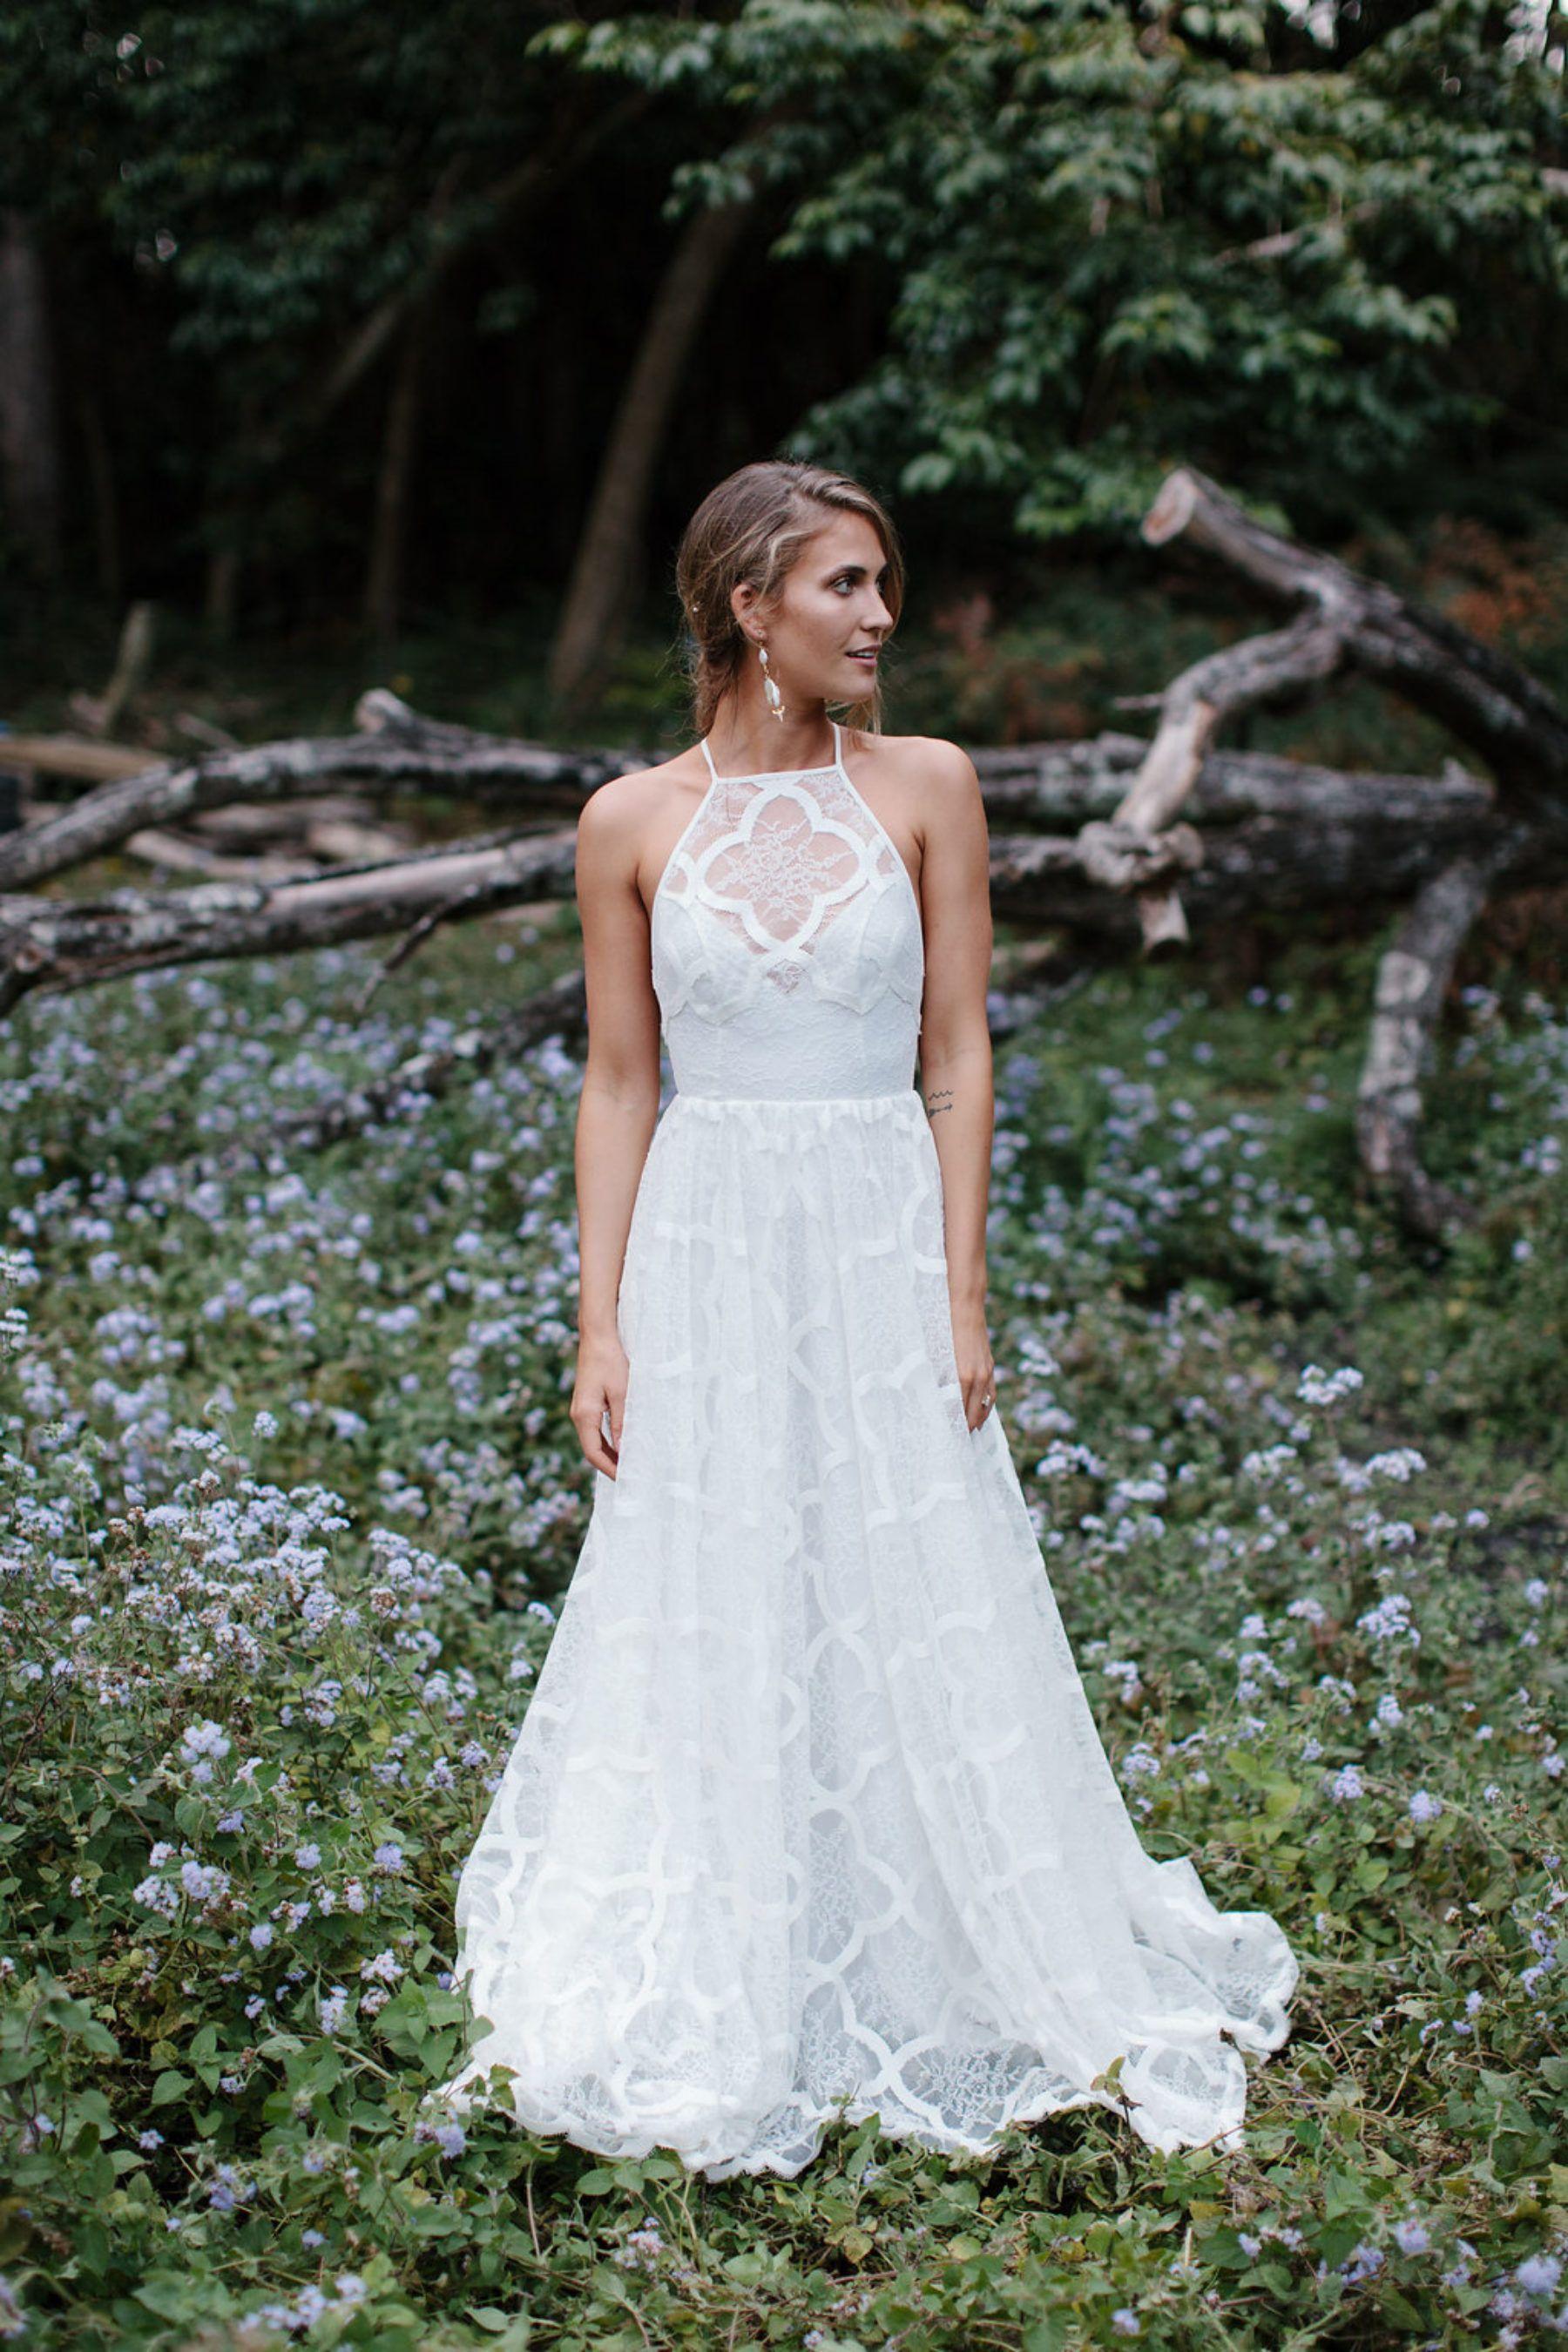 Rebecca Riley S Earthy Byron Bay Wedding Nouba Com Au Wedding Dresses Lace Wedding Dresses Grace Loves Lace [ 2700 x 1800 Pixel ]